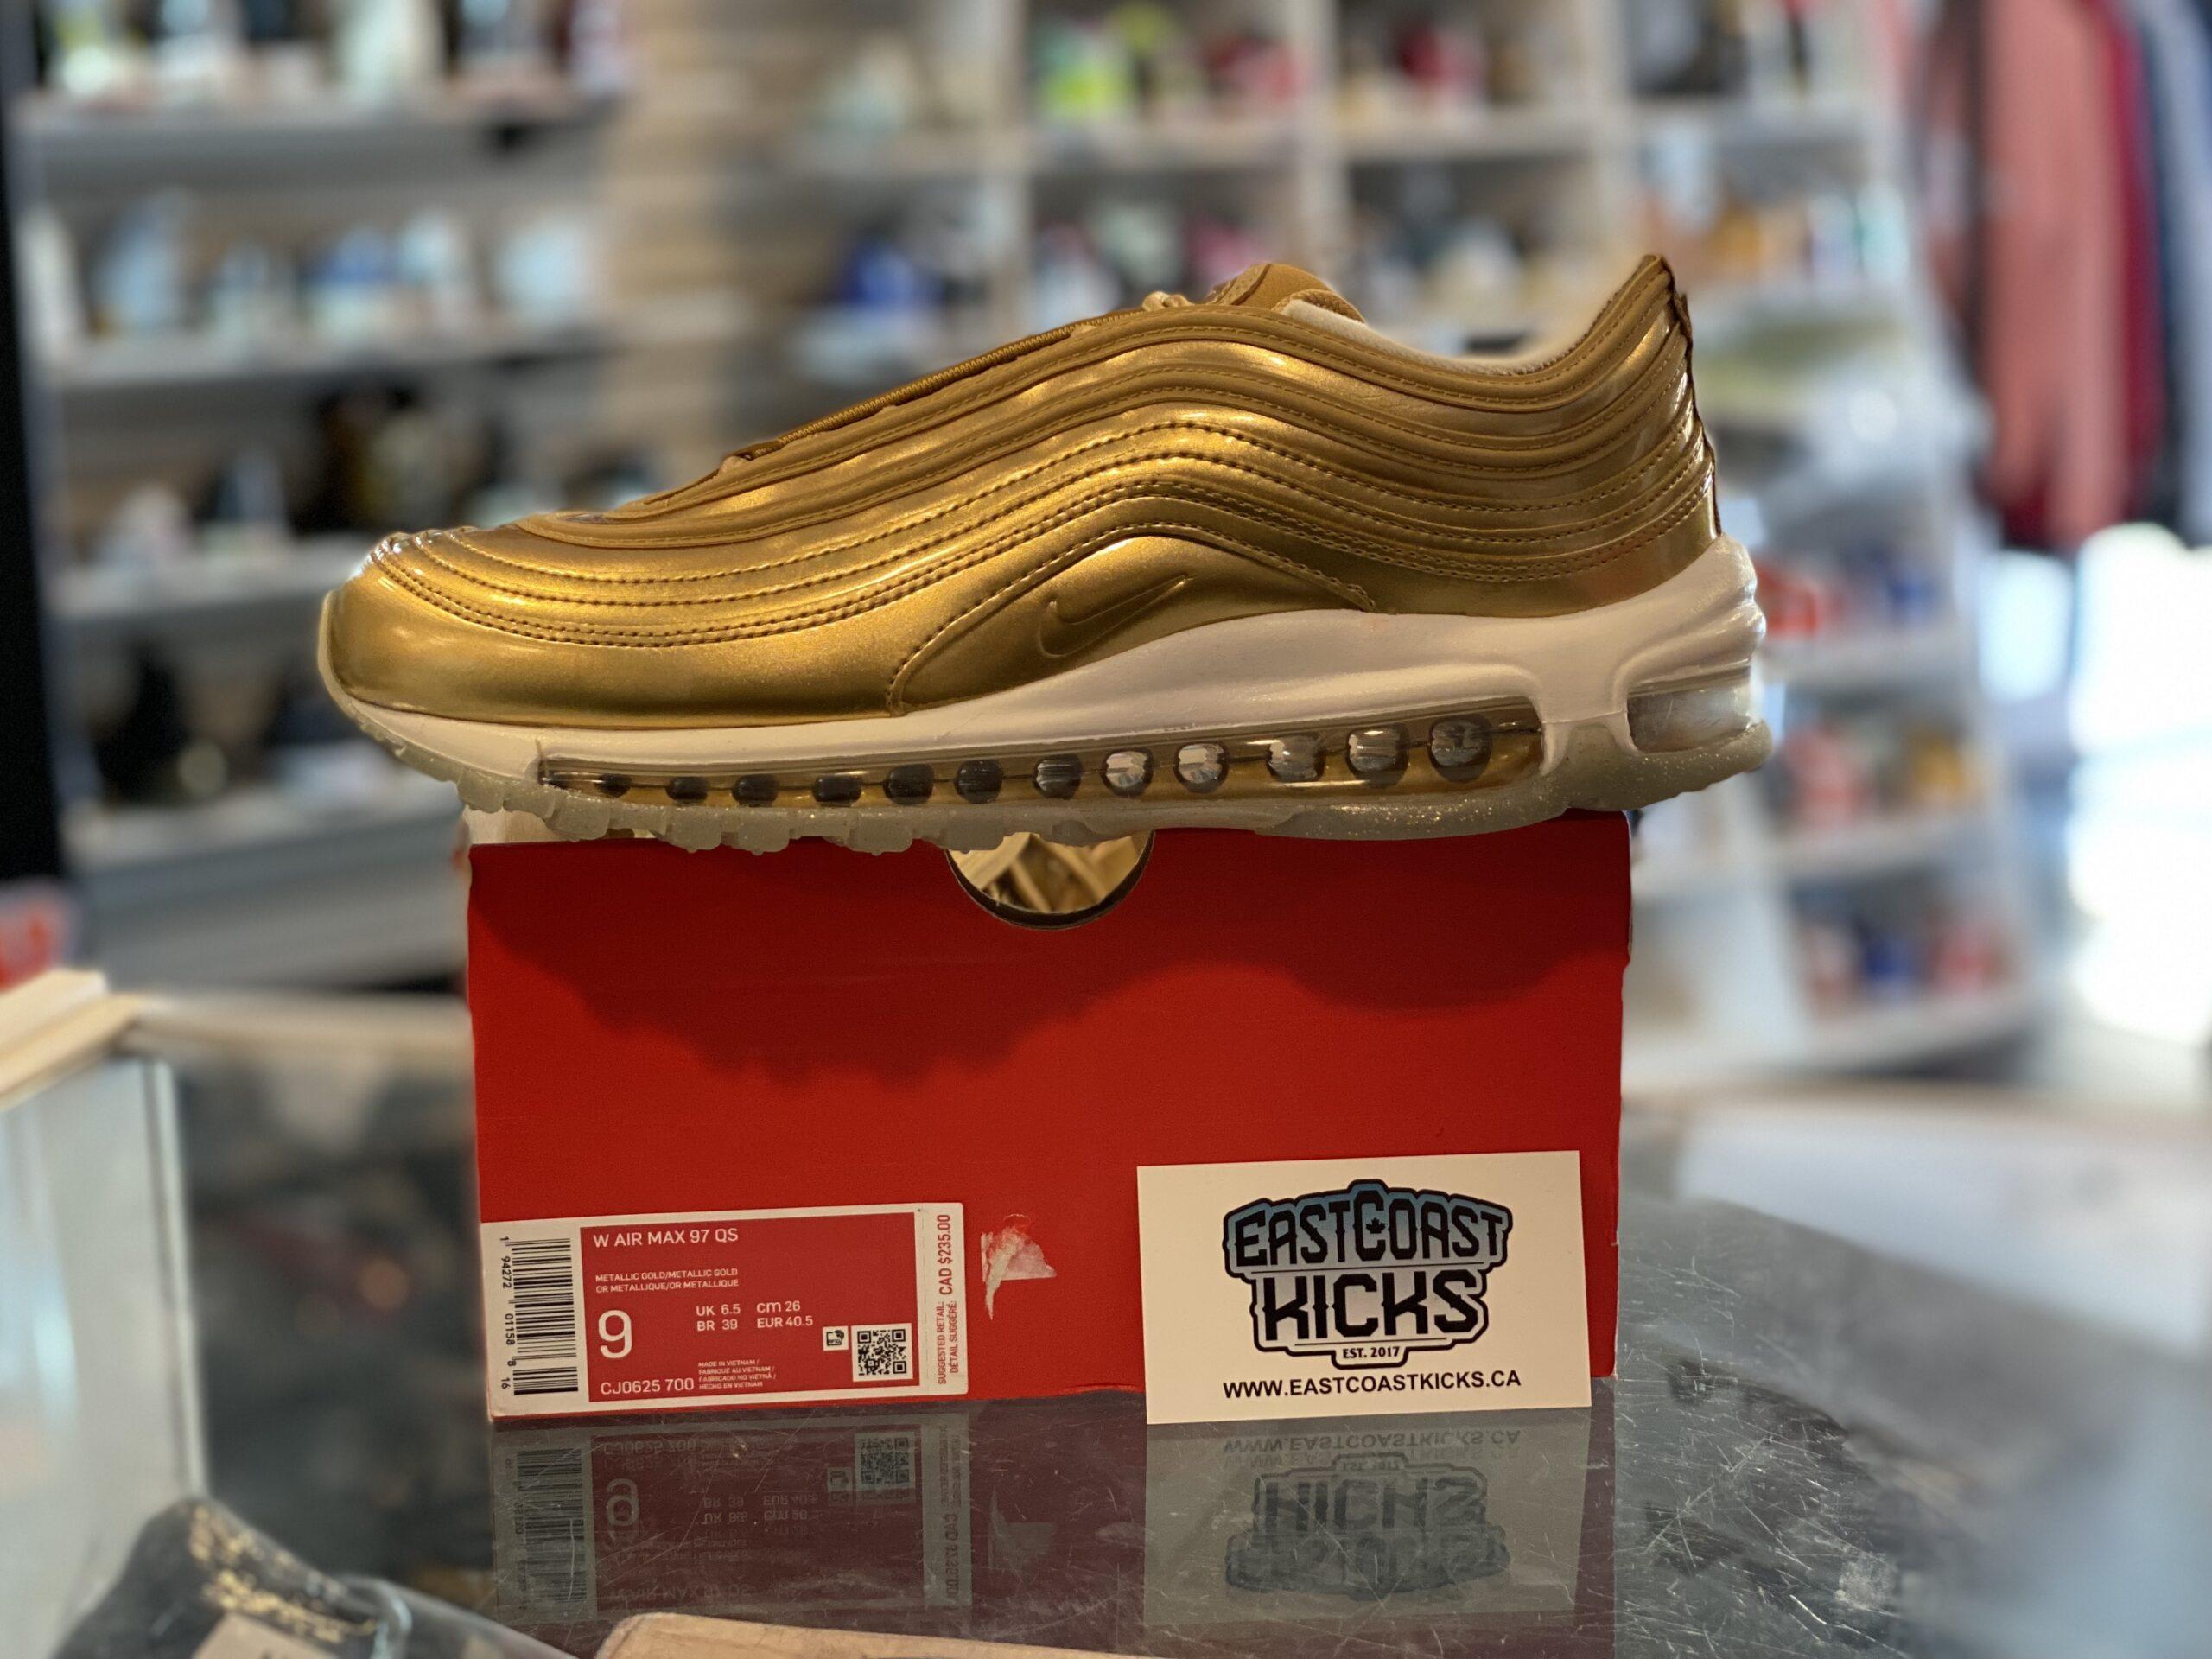 Nike Air Max 97 Gold Size 9W/7.5M